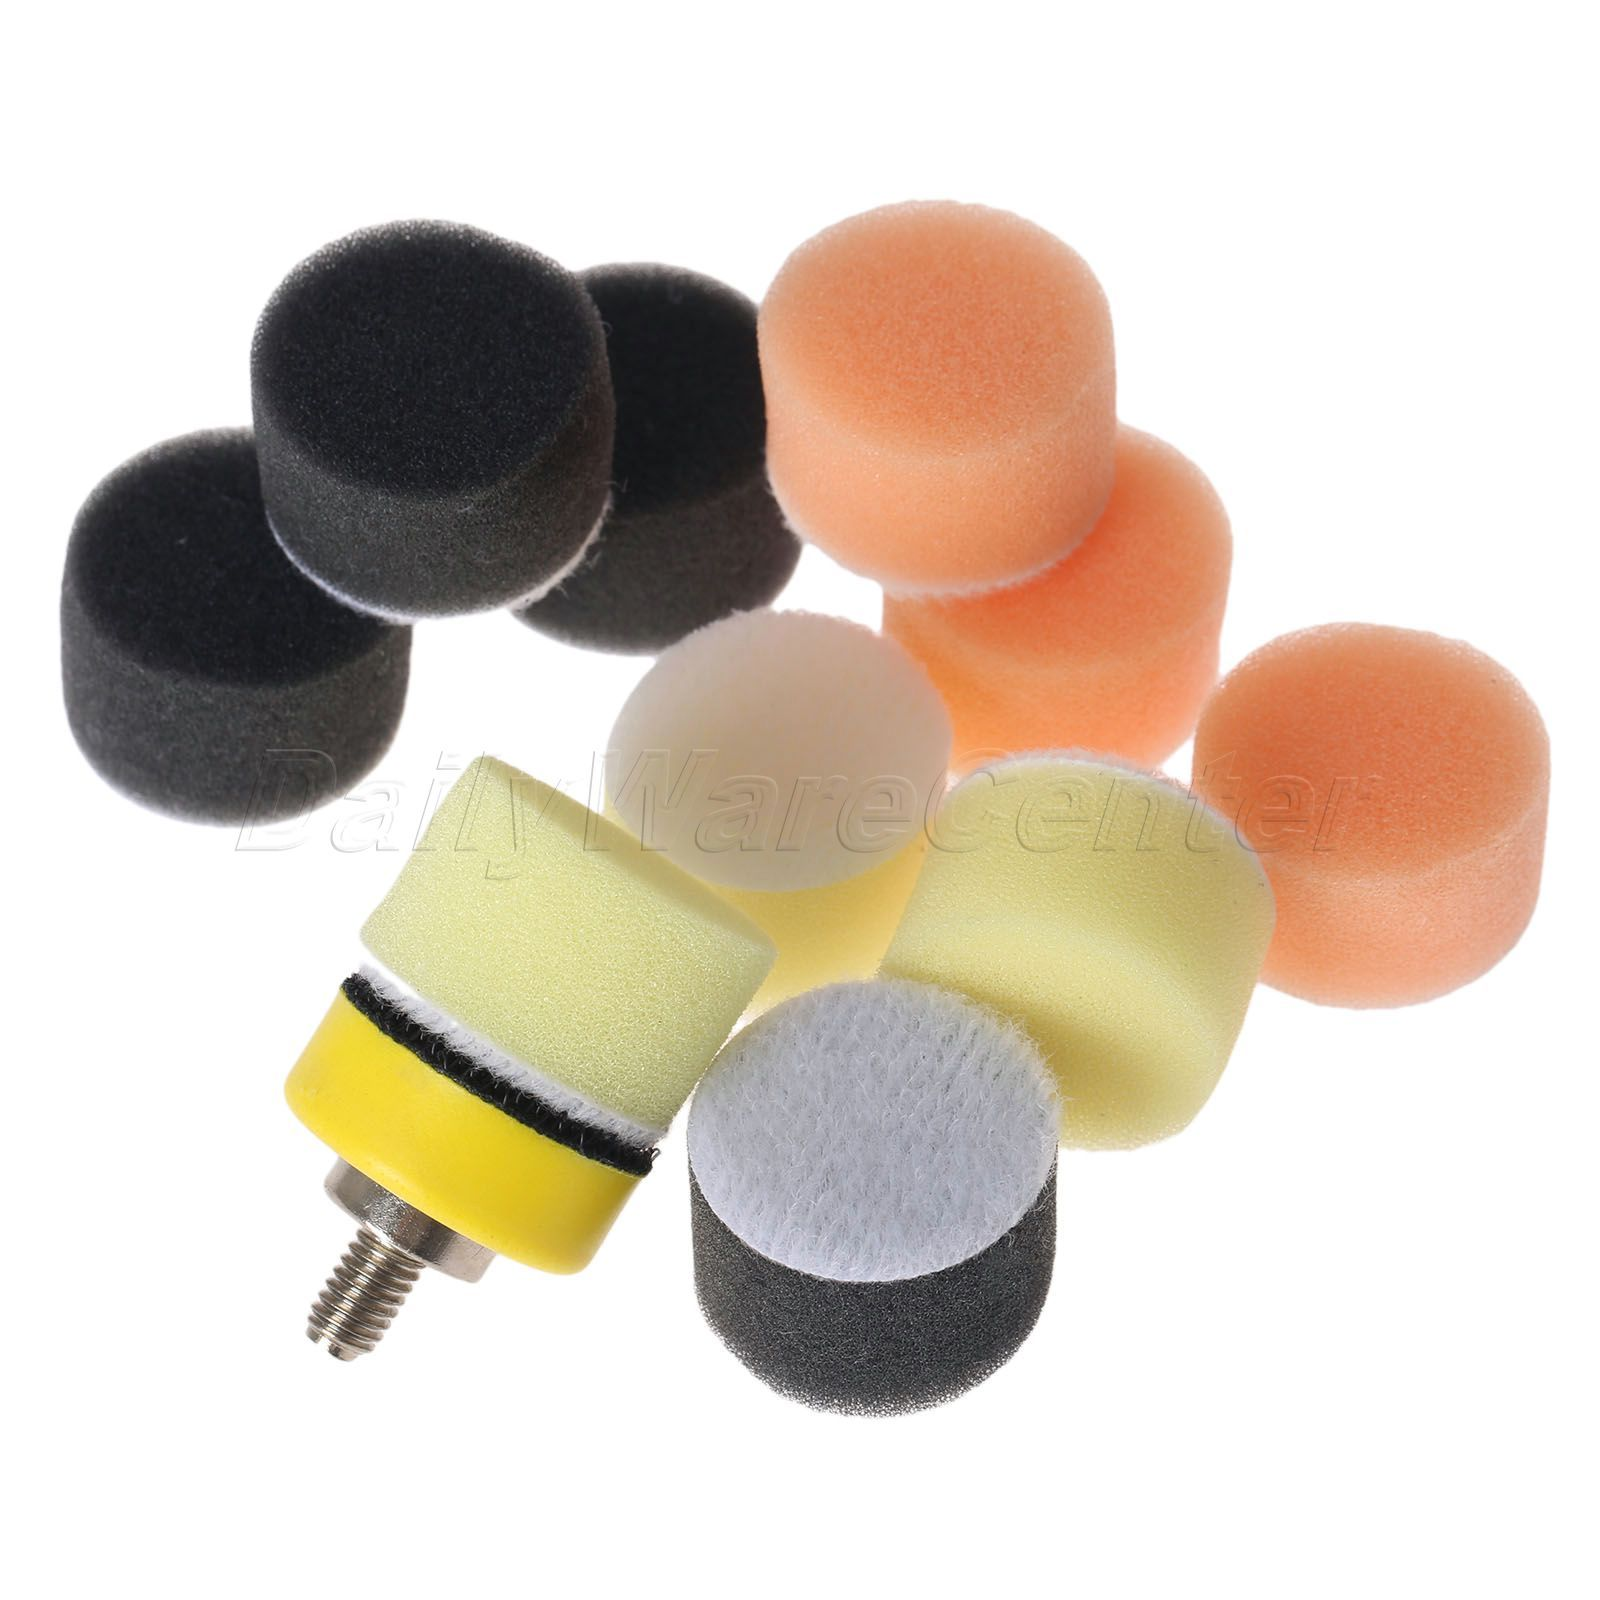 150pcs 1 25mm Sponge Buff Polishing Pad Kit Car Polisher M6 5pcs Automotive Wiring Harness Terminal Removal Tools Maintenance Backer